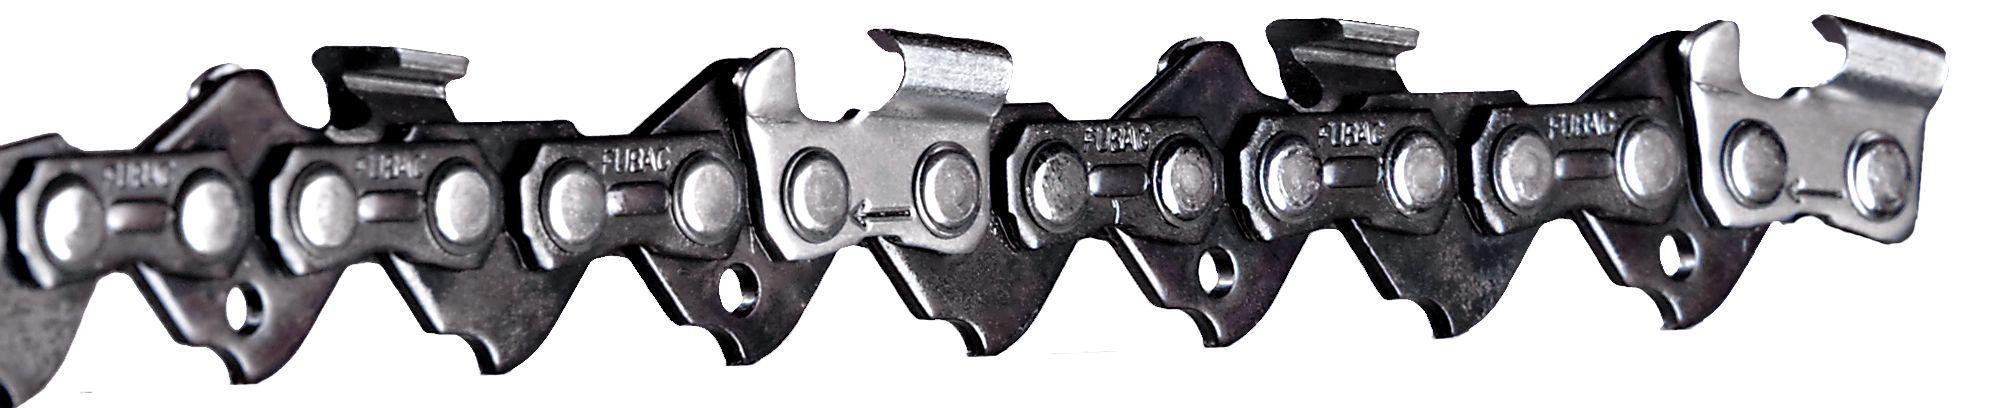 Цепь Fubag Fcu 325-72 шина 18 0 325 1 5 мм 72 звена husqvarna 5859433 72